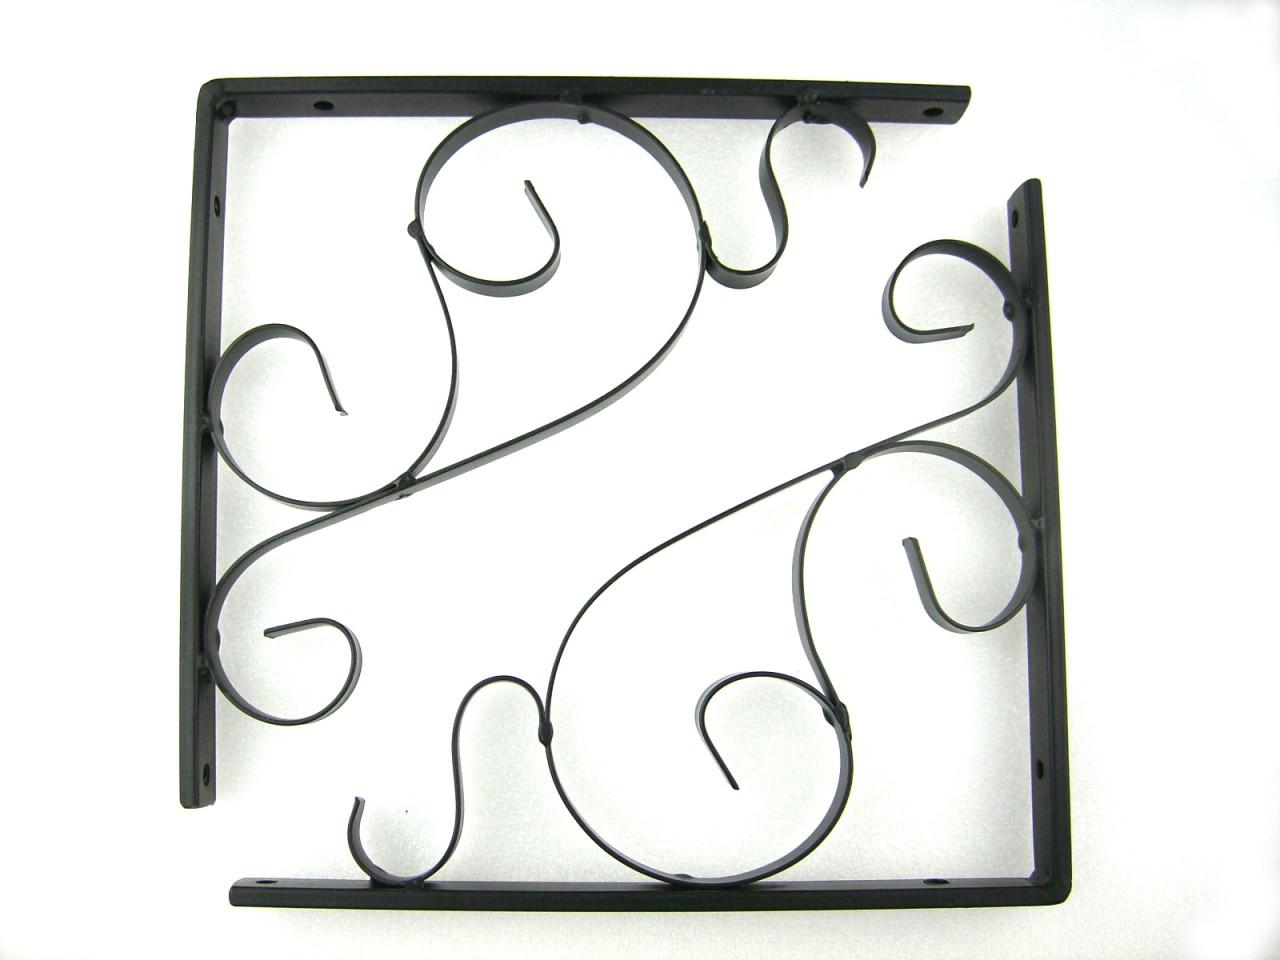 Pair Of Iron Metal Black Decorative Wall Shelf Brackets